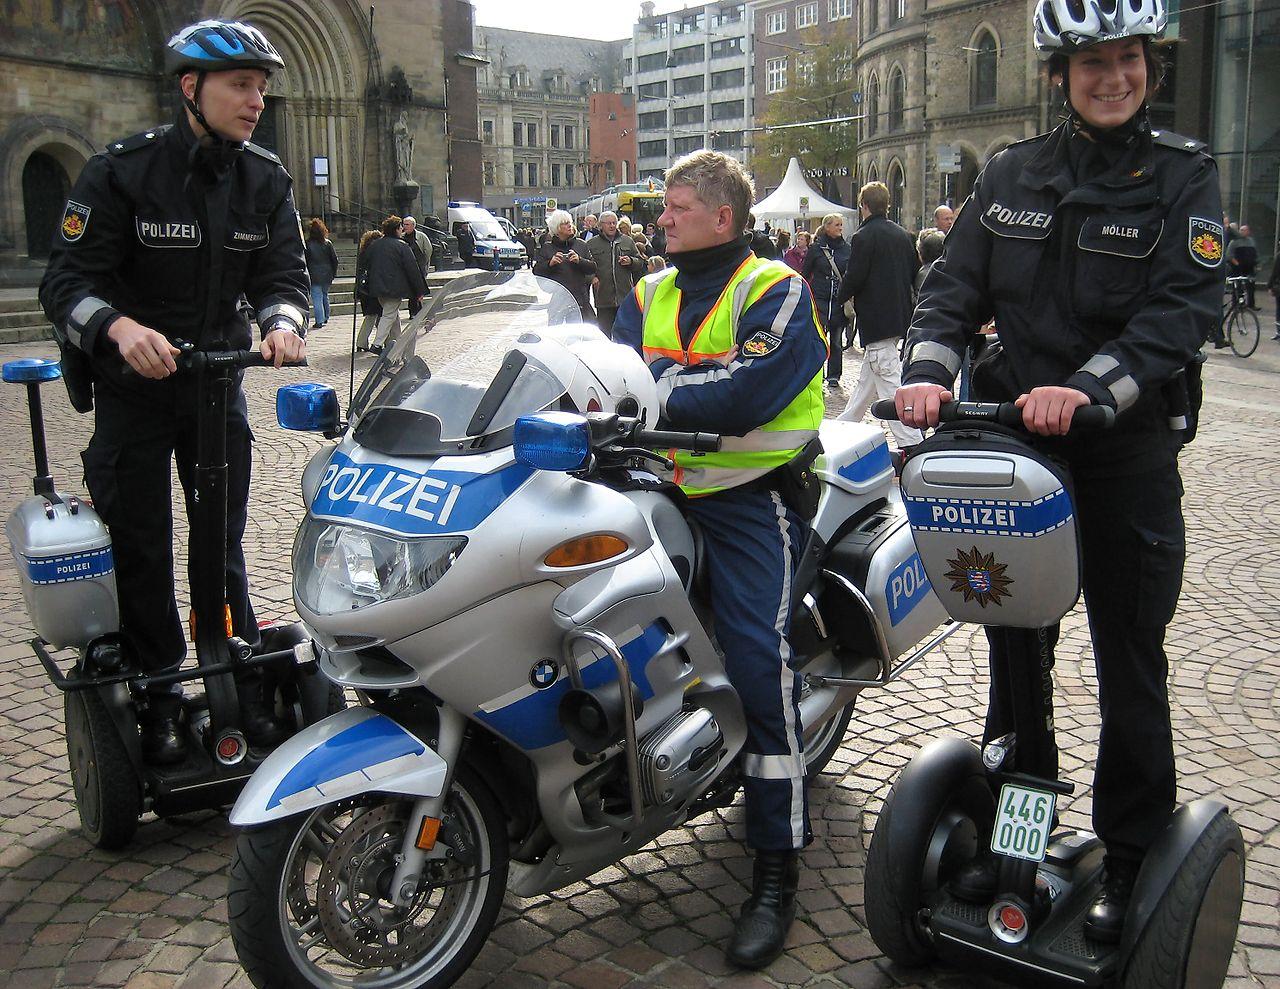 File Polizei Bremen 2010 01 Jpg Wikimedia Commons